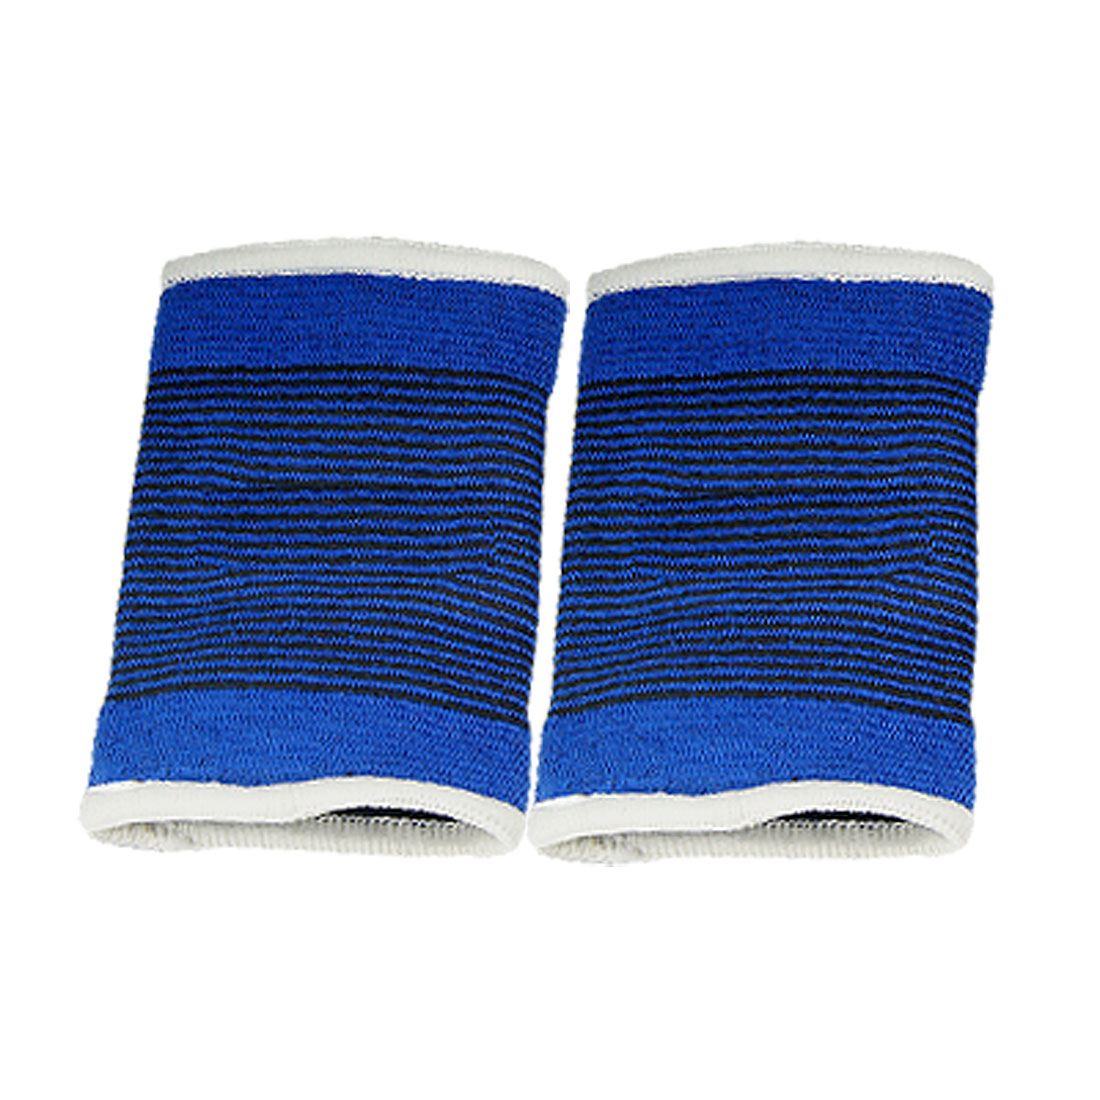 2 Pcs Black Pinstripe Blue Elastic Wrist Support Brace